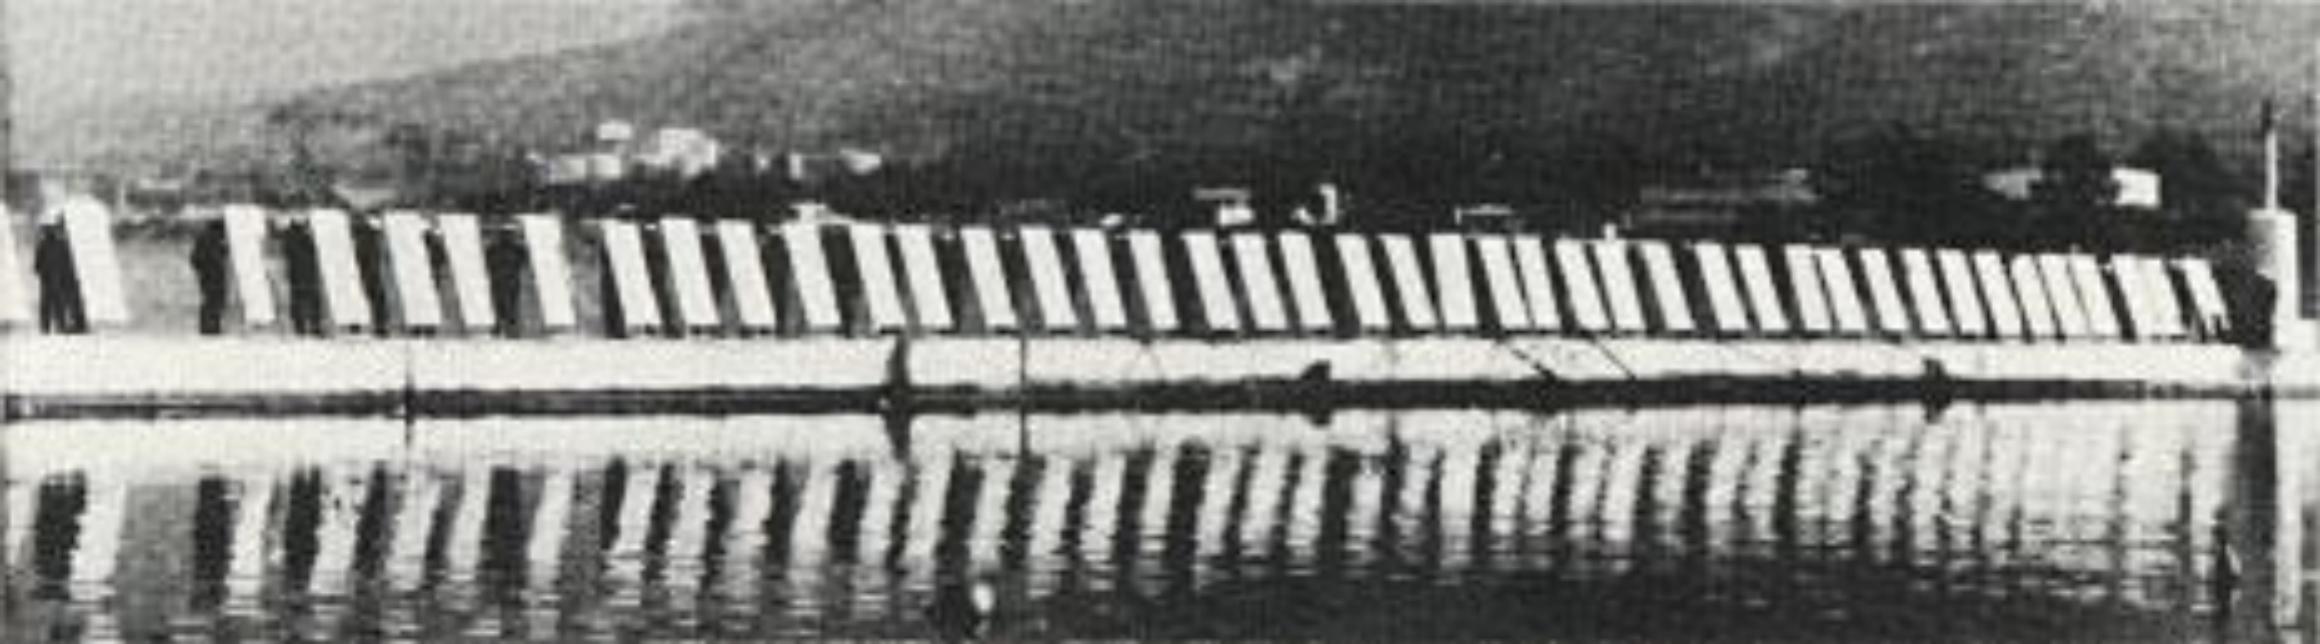 ioannis sakkas 1975 archimedes solar weapon